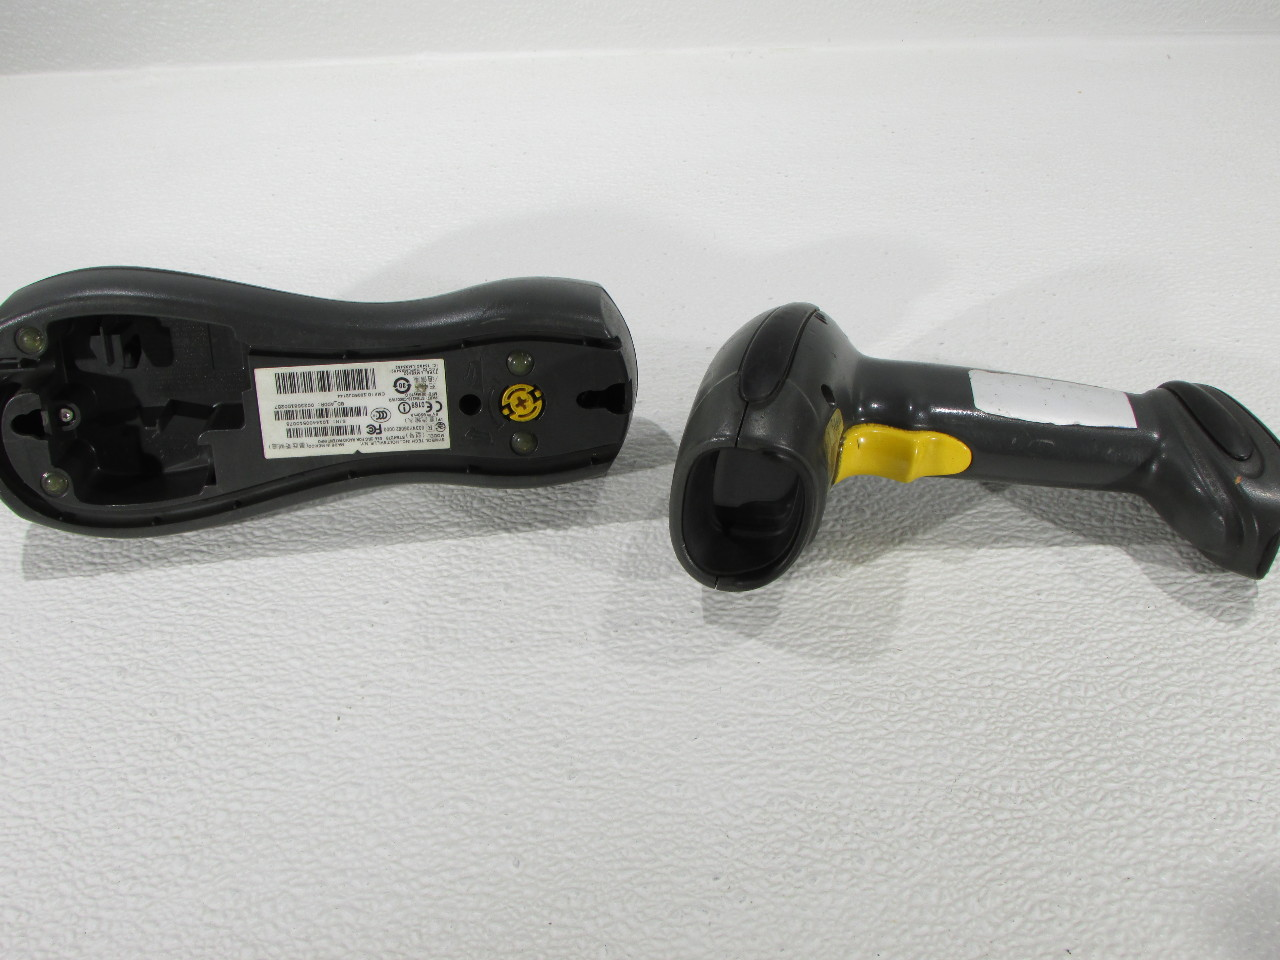 Symbol ls4278 bluetooth barcoode scanner pn ls4278 sr20007zzwr w symbol ls4278 bluetooth barcoode scanner pn ls4278 sr20007zzwr w stb4278 cradle biocorpaavc Images